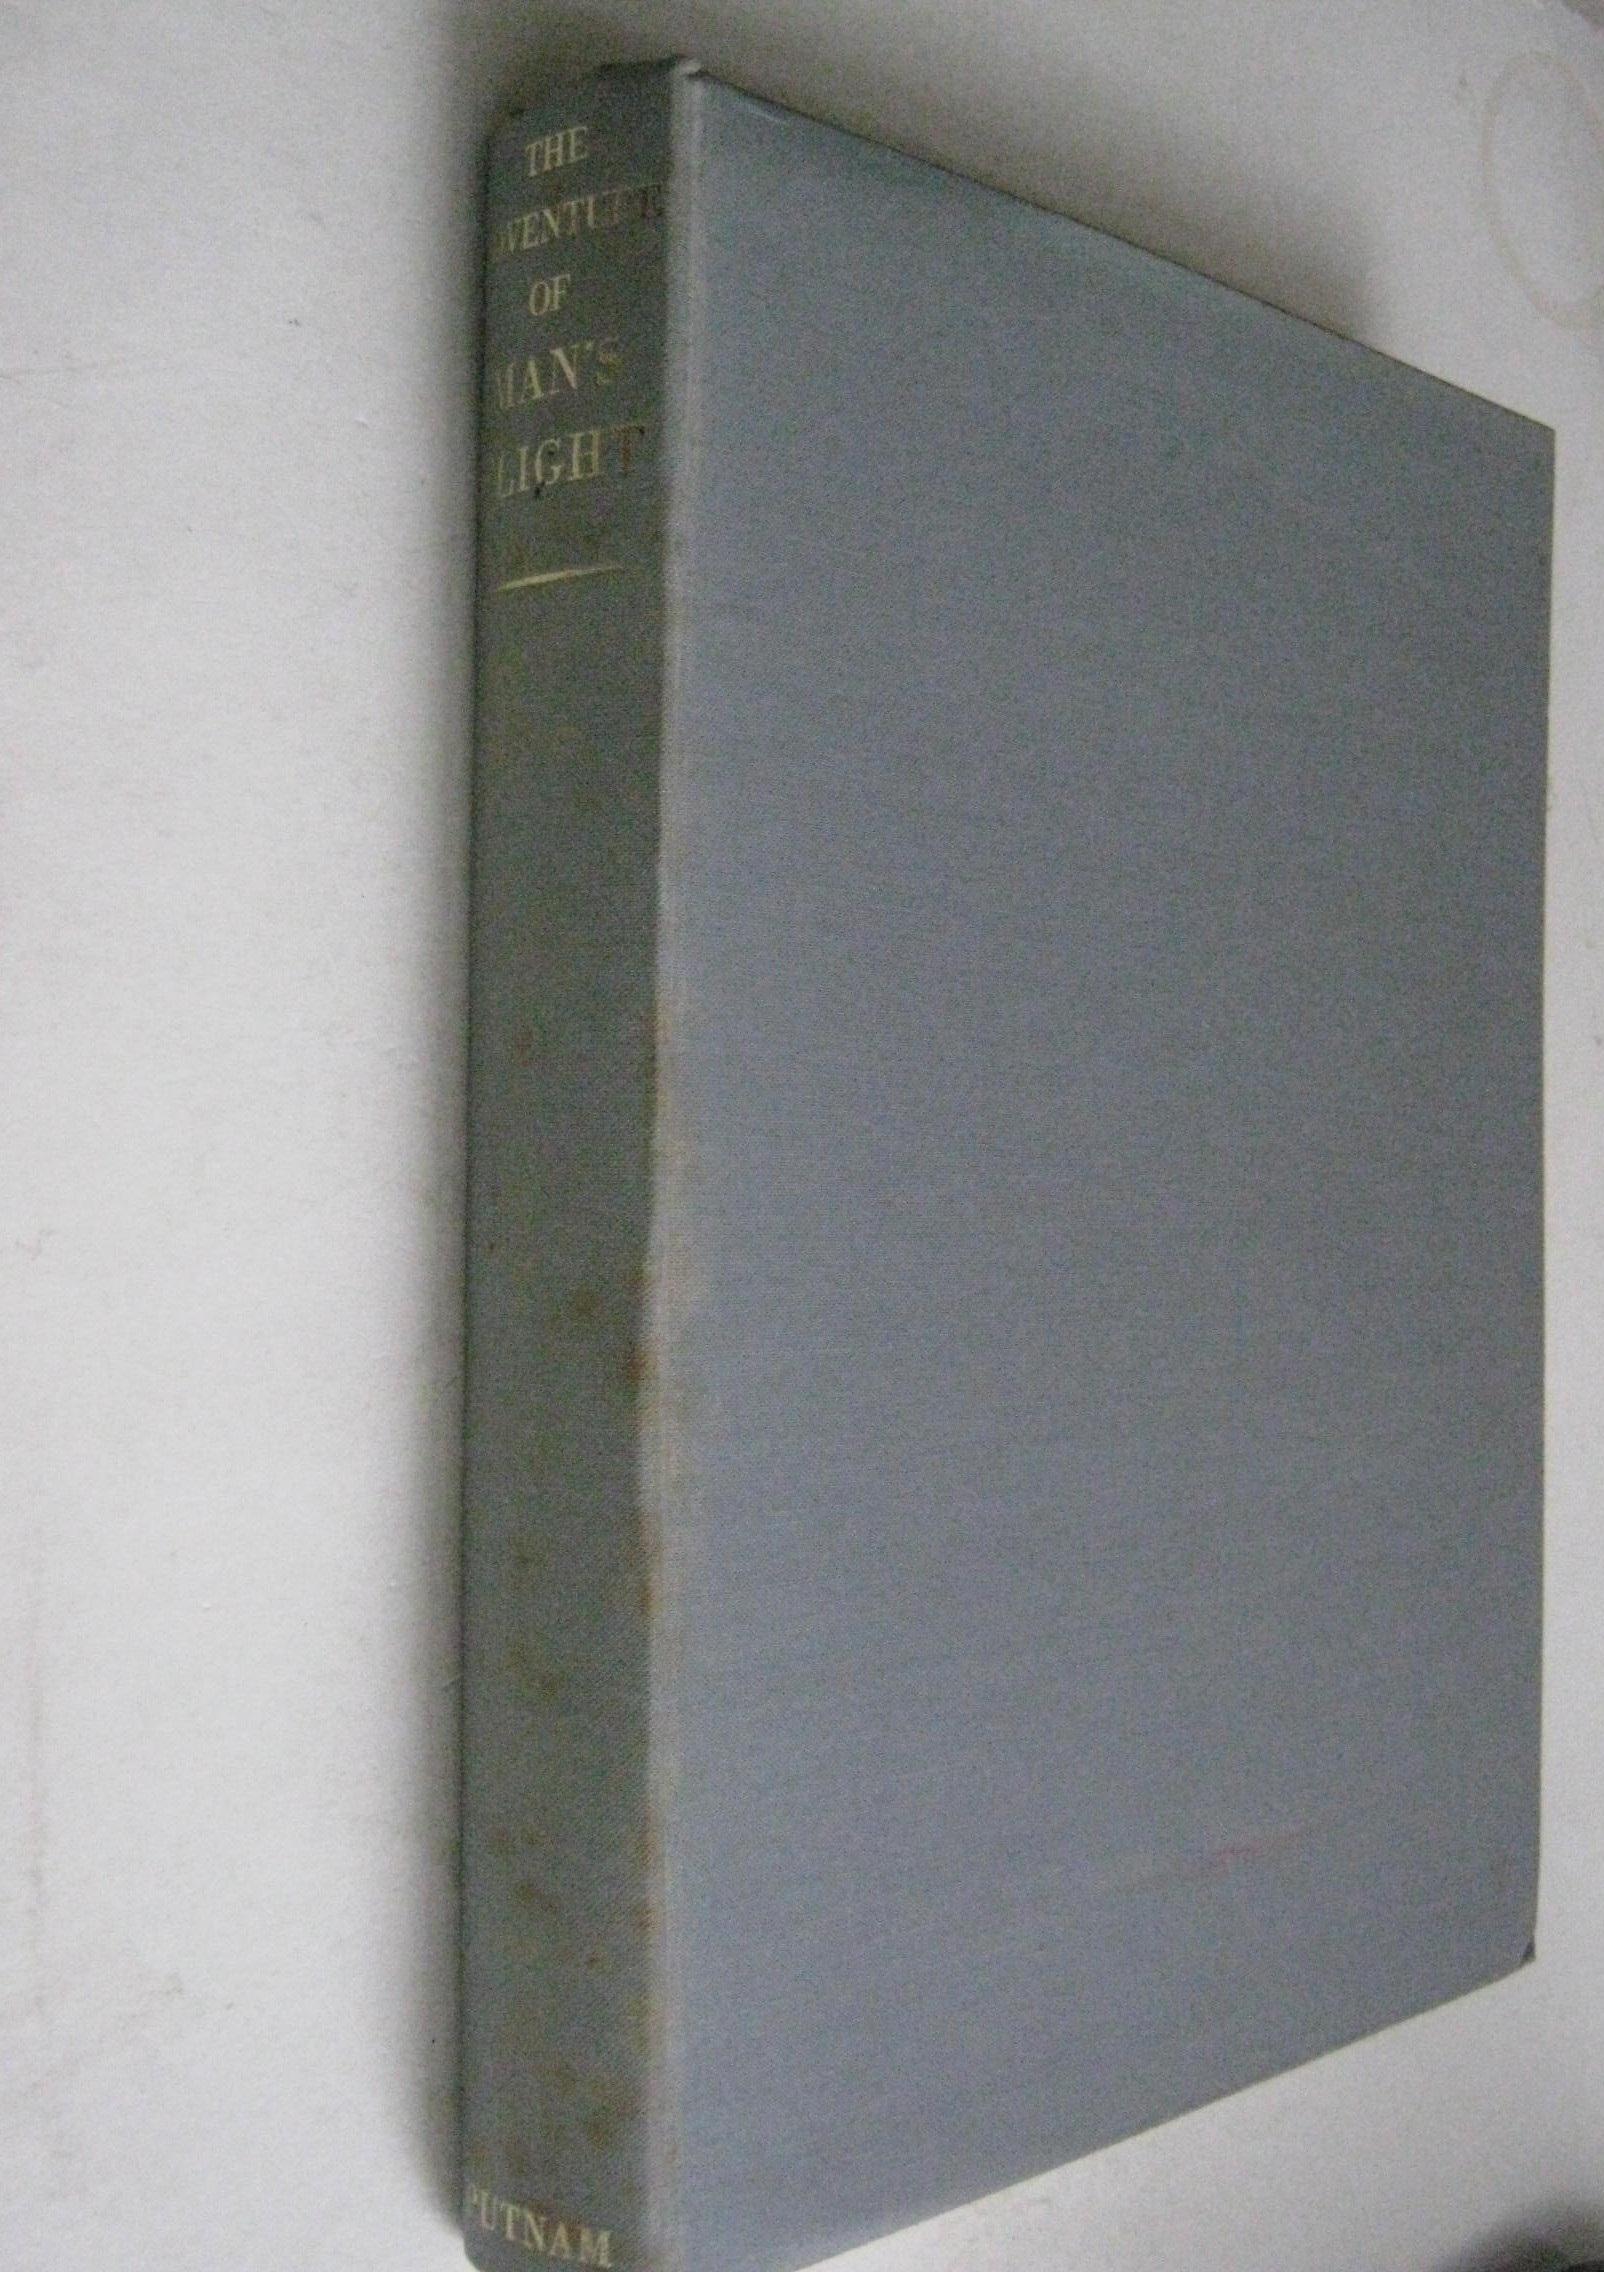 The Adventure of Man's Flight :, Josephy, A. M. ;(ed)